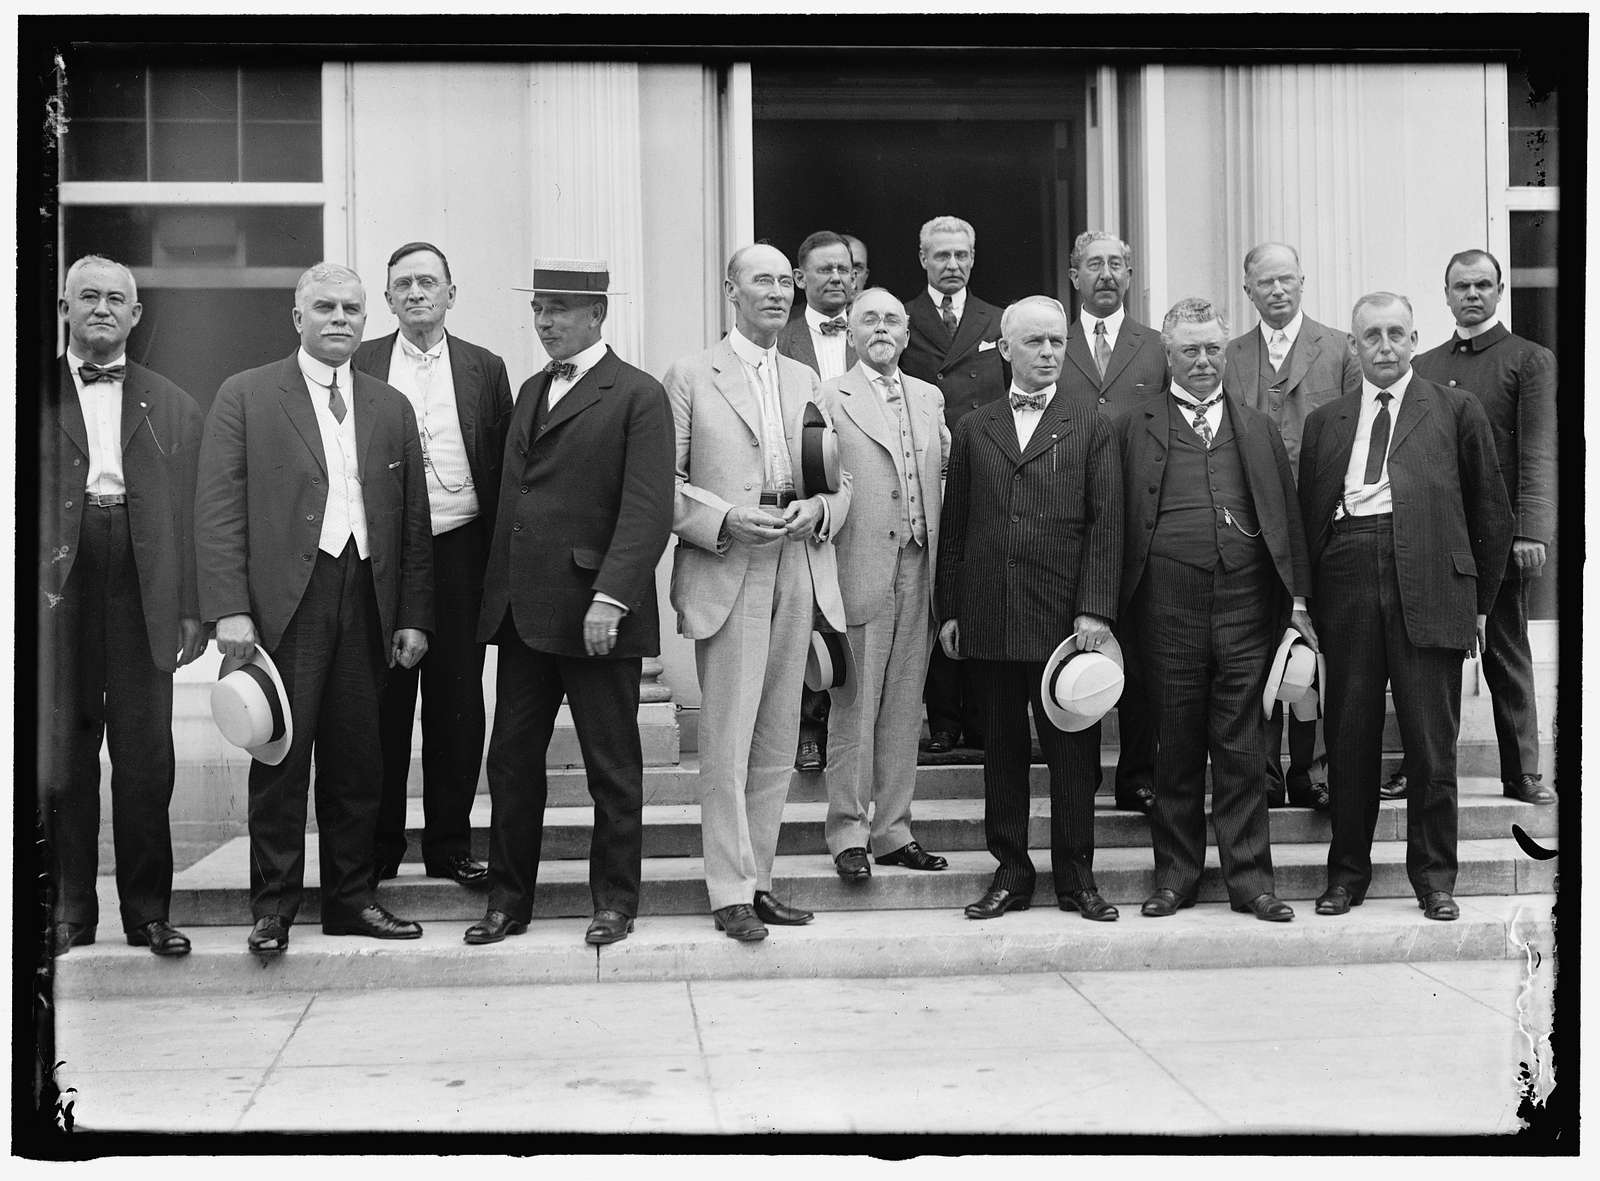 RAILROAD MEN AT WHITE HOUSE. HEADS: W.G. LEE, PRES., BOARD OF RAILWAY TRAINMEN; WARREN B. STONE, PRES., BOARD OF LOCOMOTIVE ENGINEERS; HERMAN W. WILLS, WASHINGTON REPUBLICAN LABOR ORGS.; ALFRED H. SMITH, V.P., N.Y.C. RAILWAY; A.B. GARRETSON, PRES., ORD. RAILWAY CONDUCTORS; HEAD IN DOOR UNIDENT.; 12 FACE